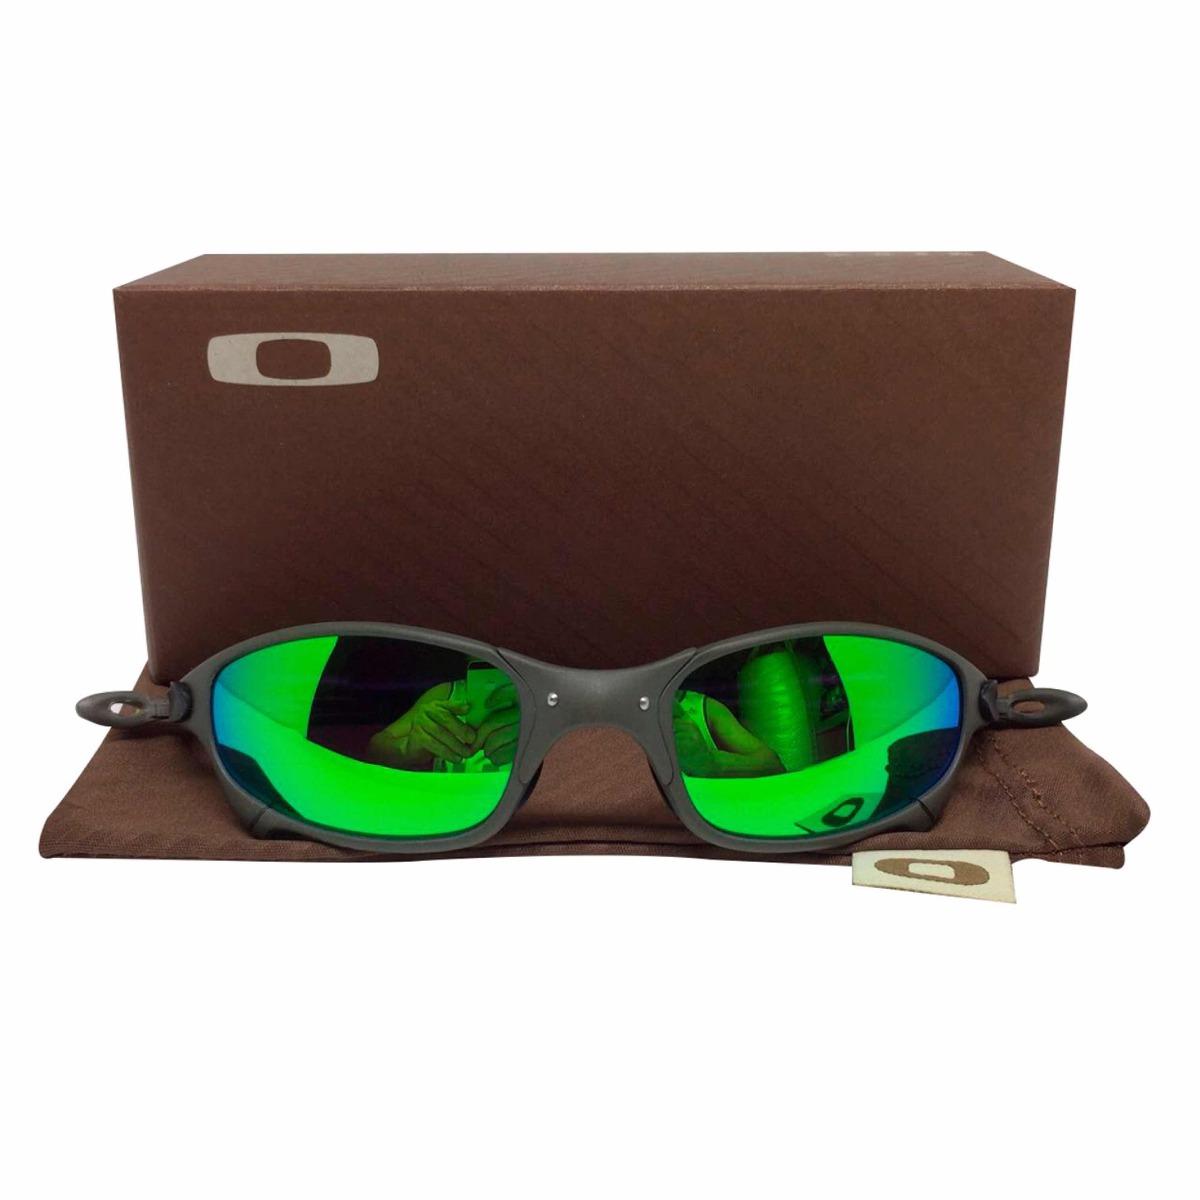 82e112694 oculos oakley juliet xmetal lente verde g26 polarizadas. Carregando zoom.